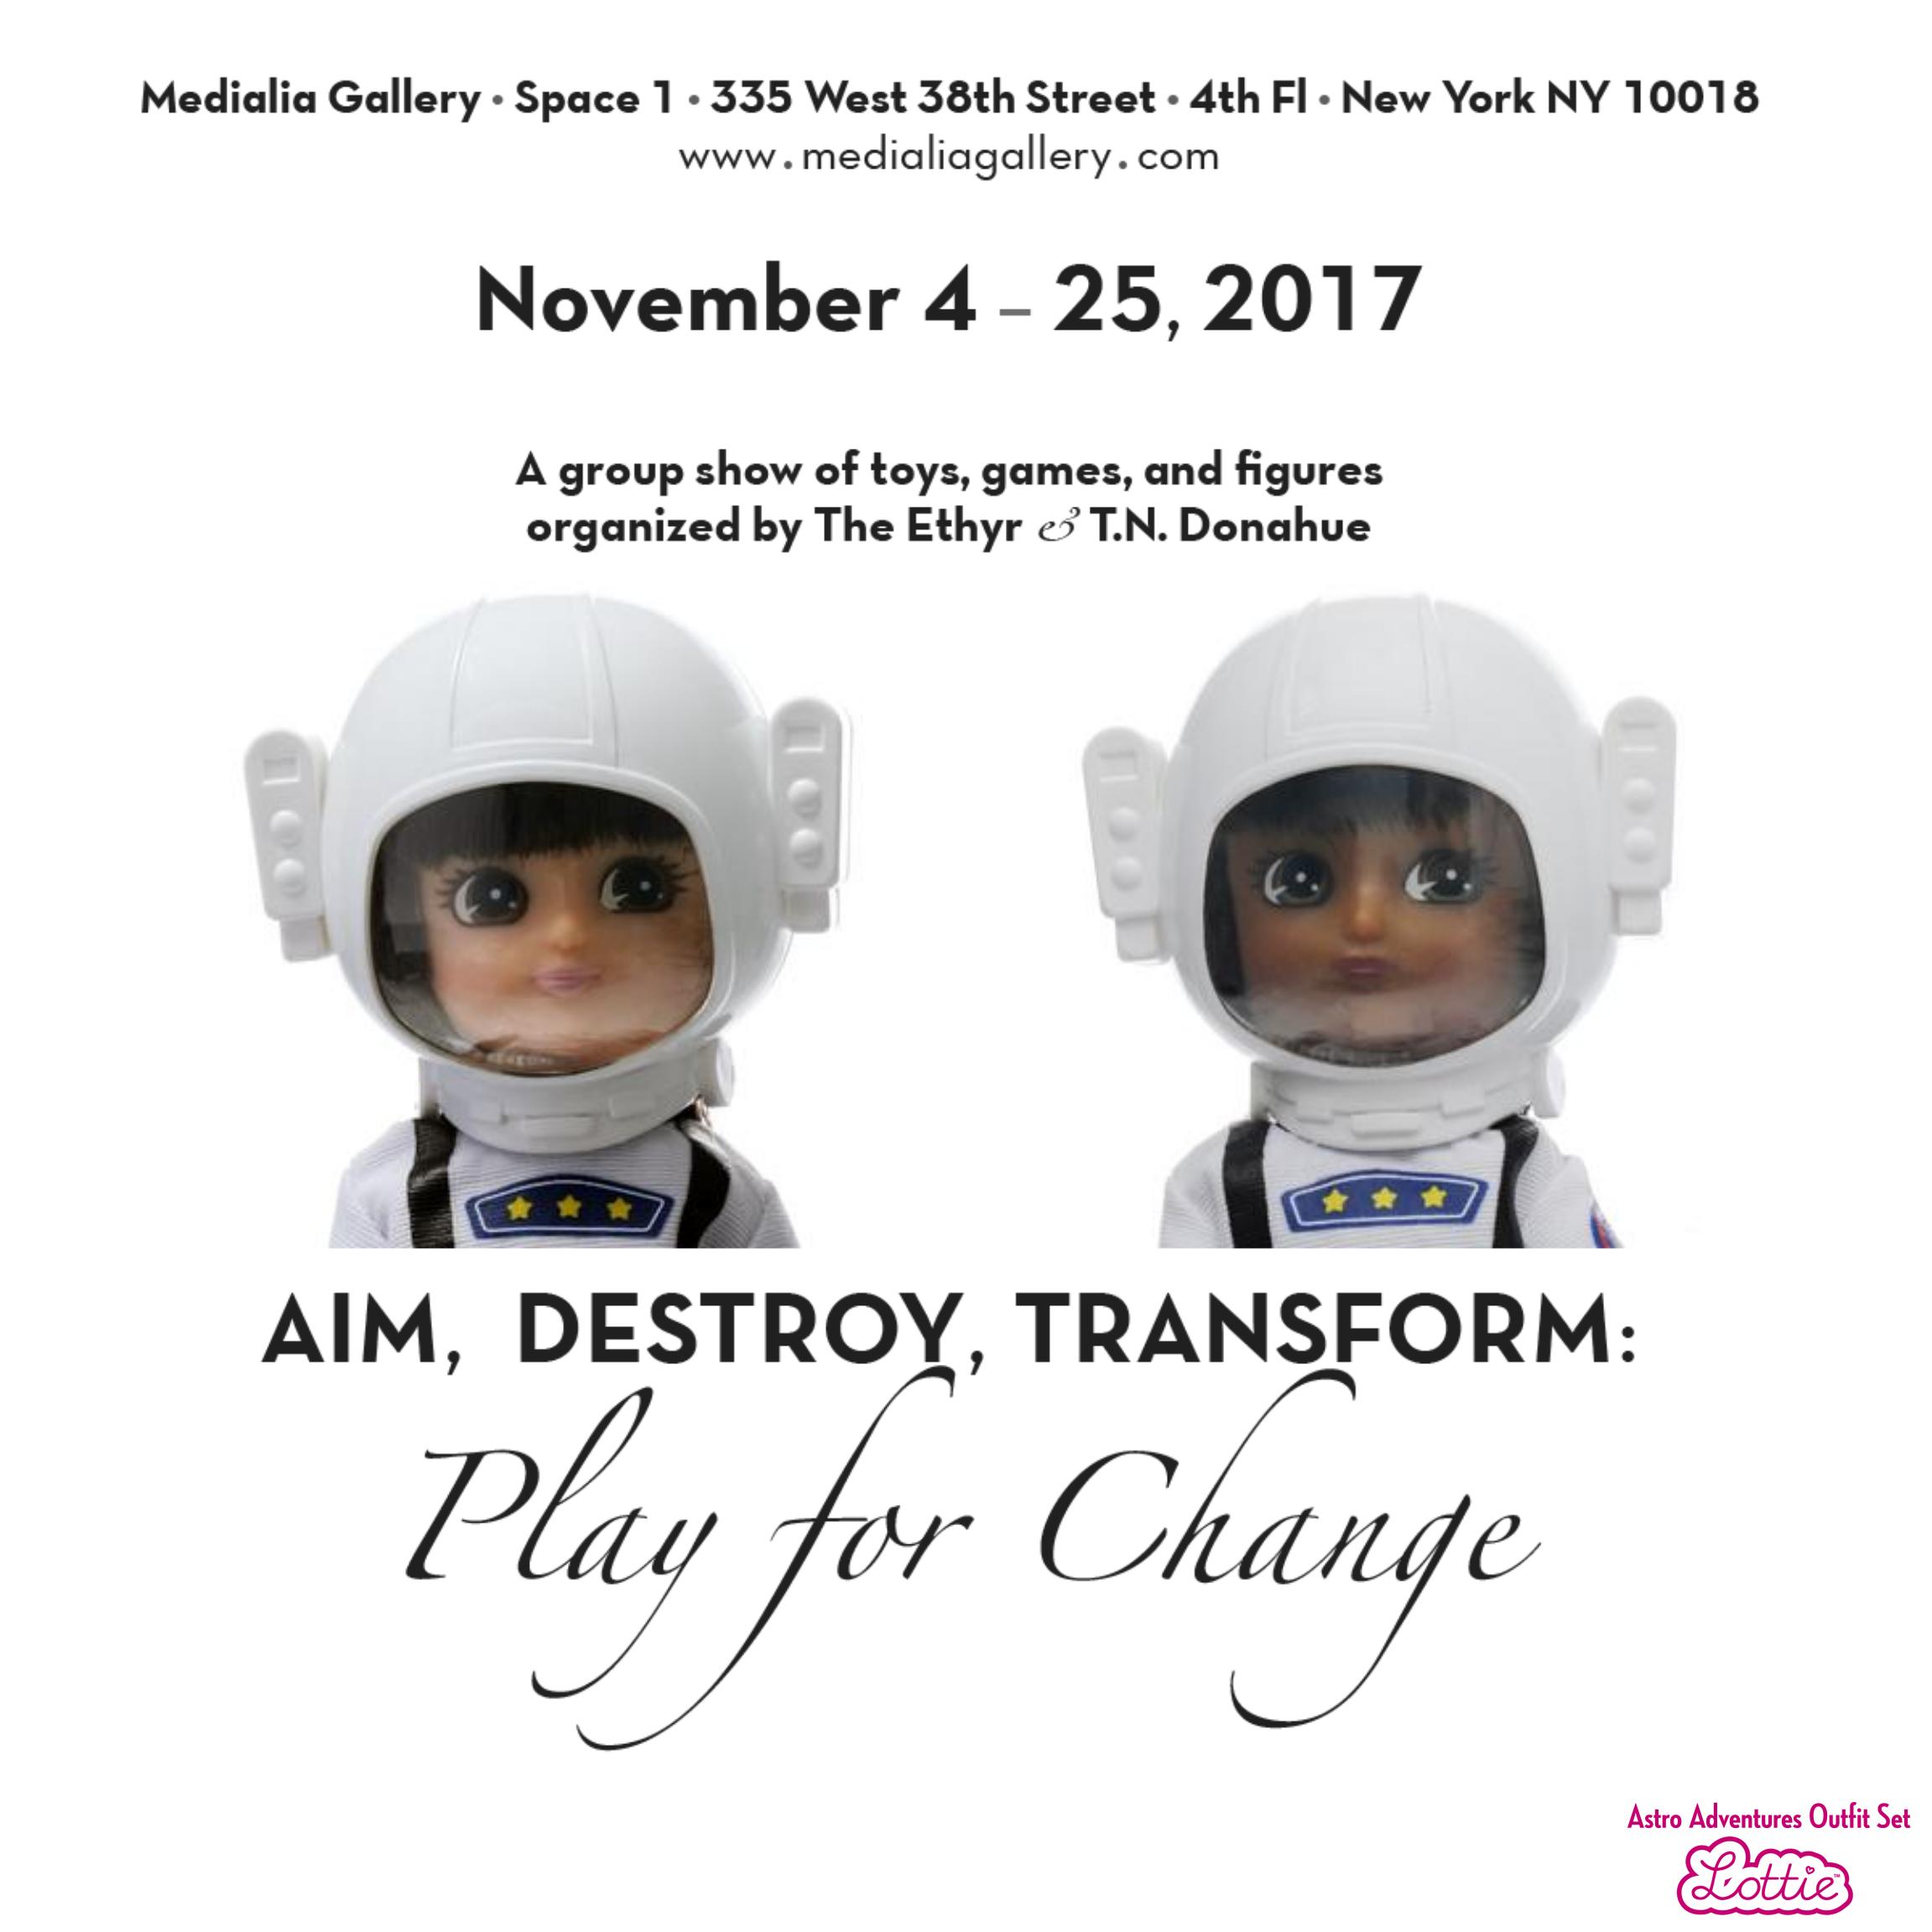 MedialiaGallery_The_Ethyr_AimDestroyTransform_Toy_Show_announcement_Lottie_Dolls_II_November_2017.jpg.png